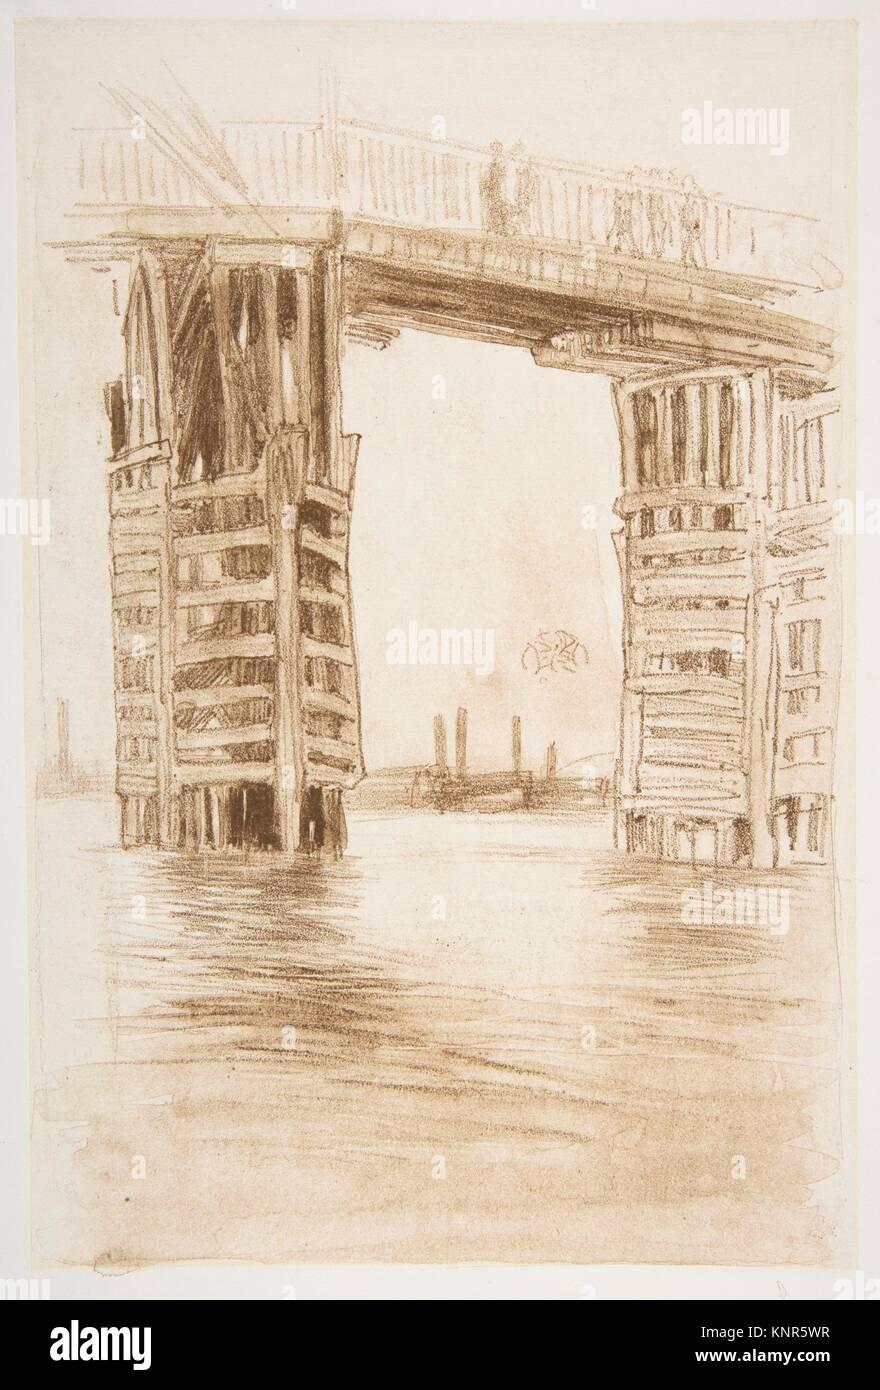 The Tall Bridge. Artist: James McNeill Whistler (American, Lowell, Massachusetts 1834-1903 London); Date: 1878; - Stock Image